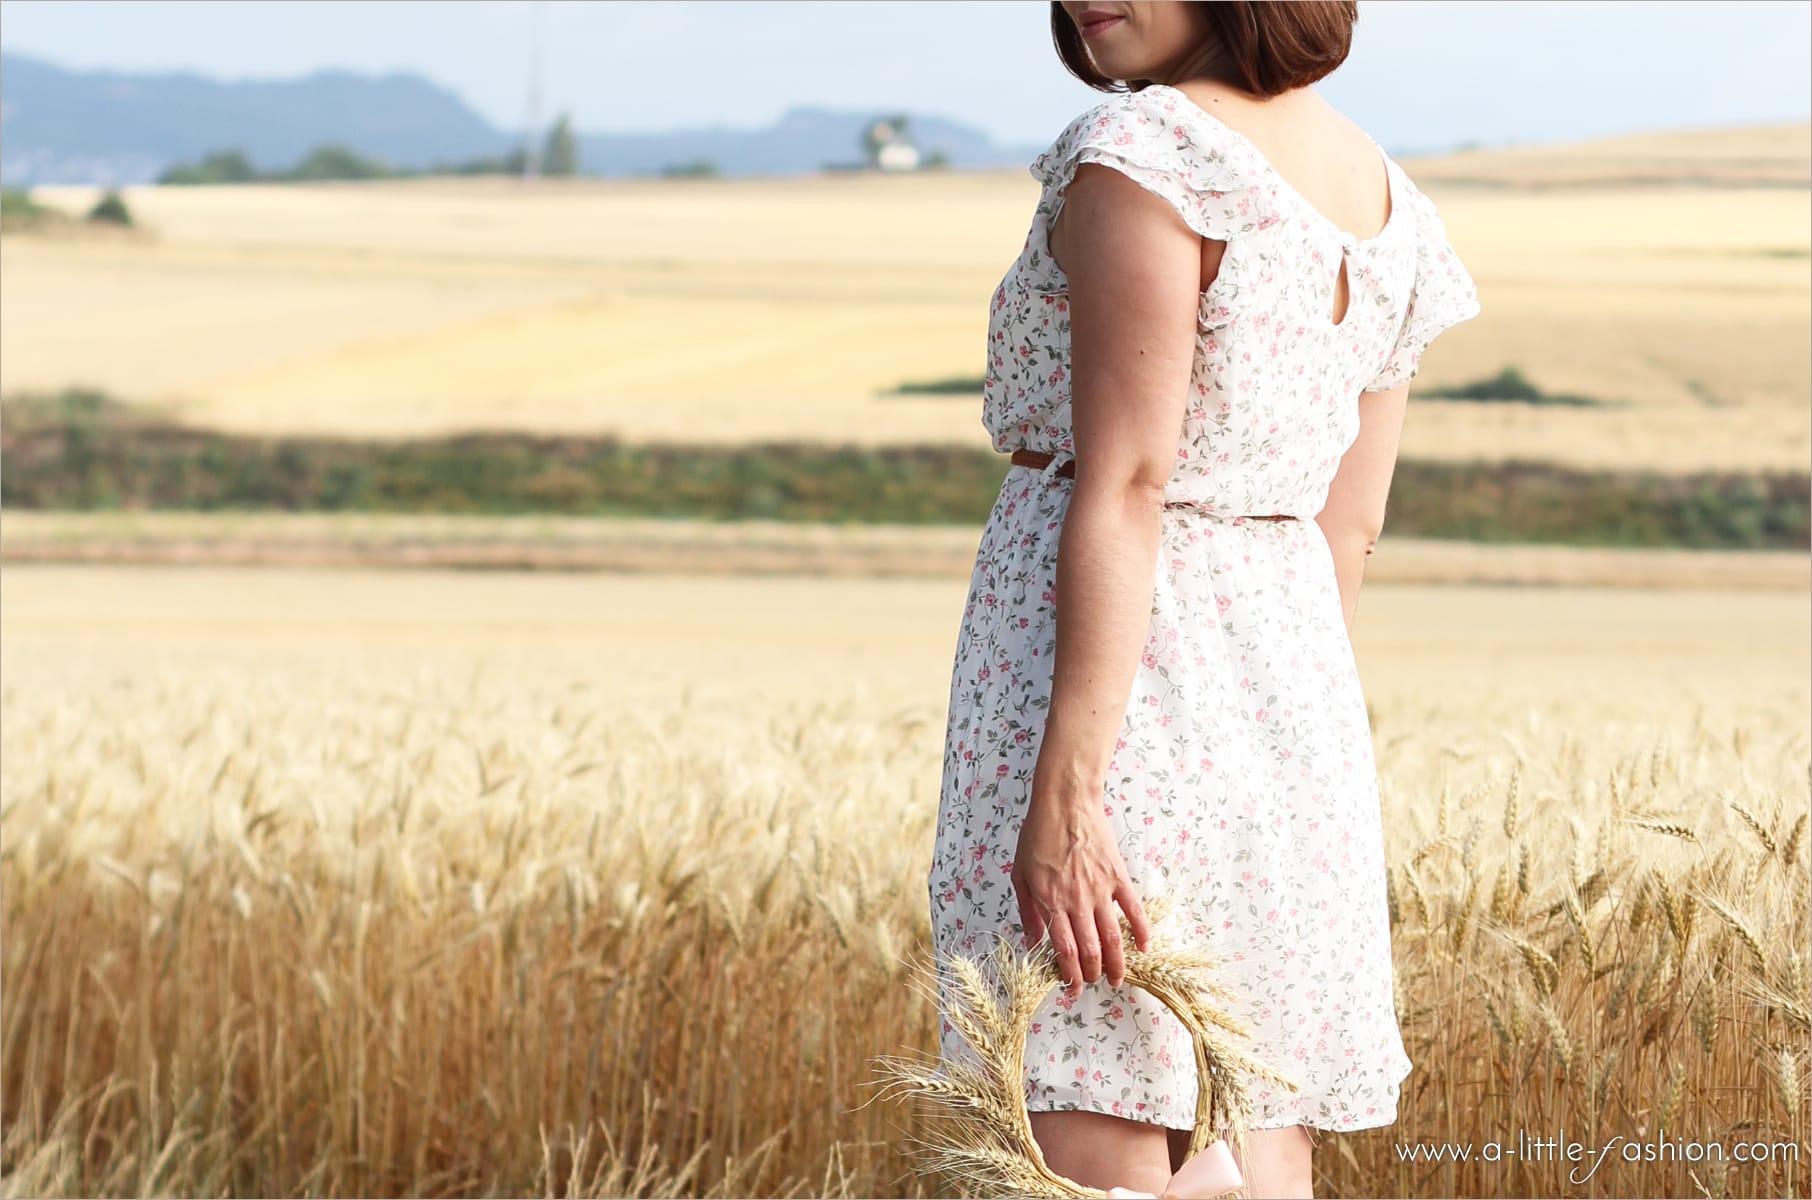 fashion_trends_2016_sommer-kleider_style-inspiration0-min2